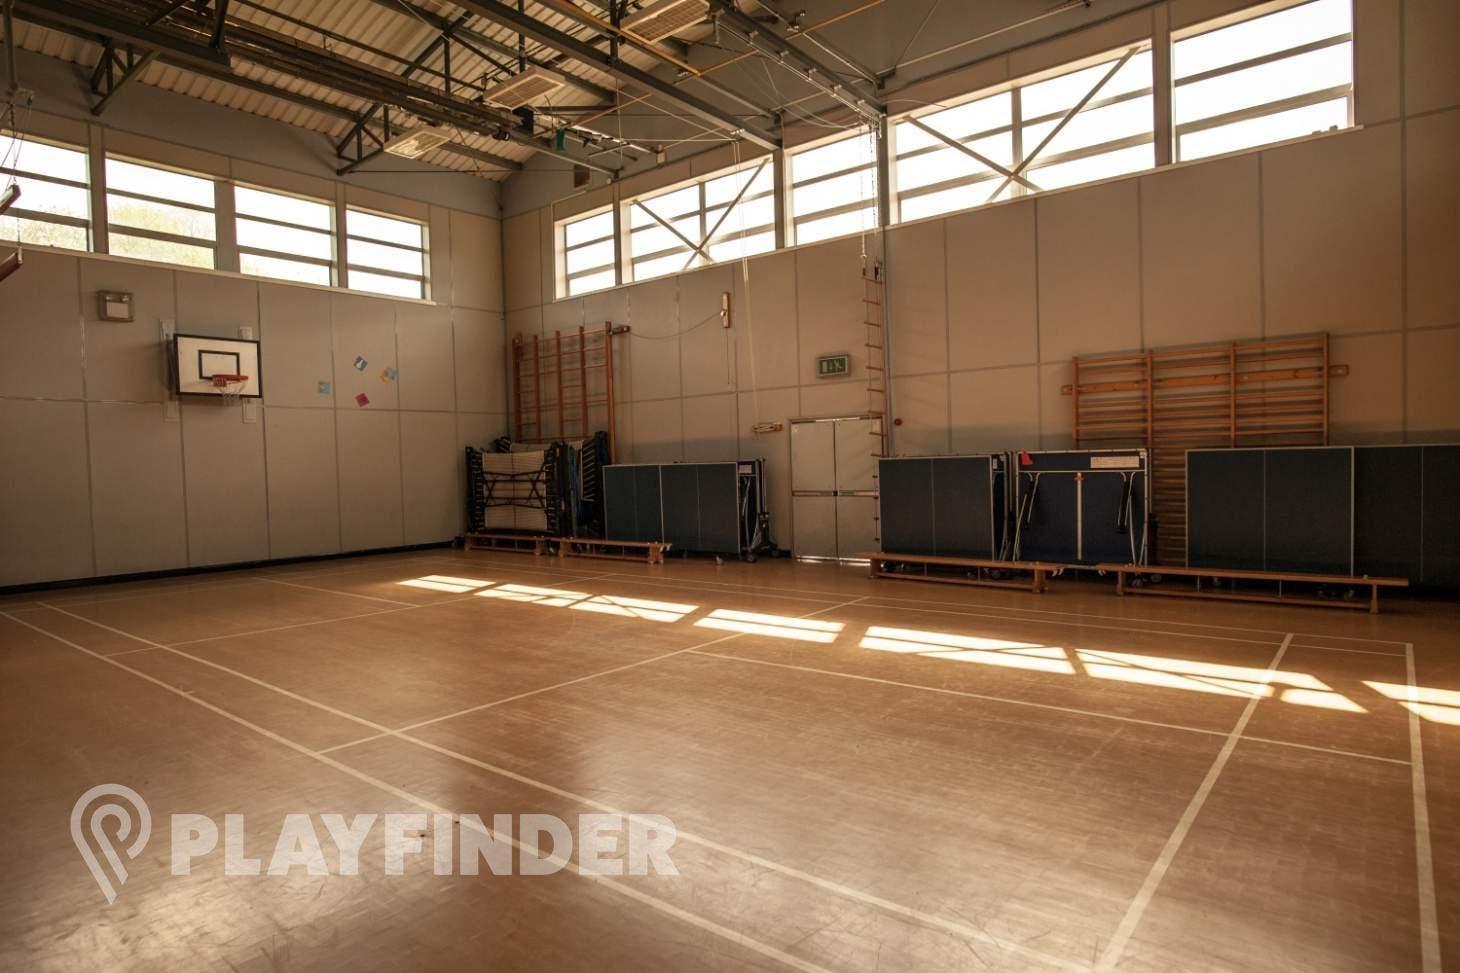 Chorlton High School Indoor | Hard badminton court